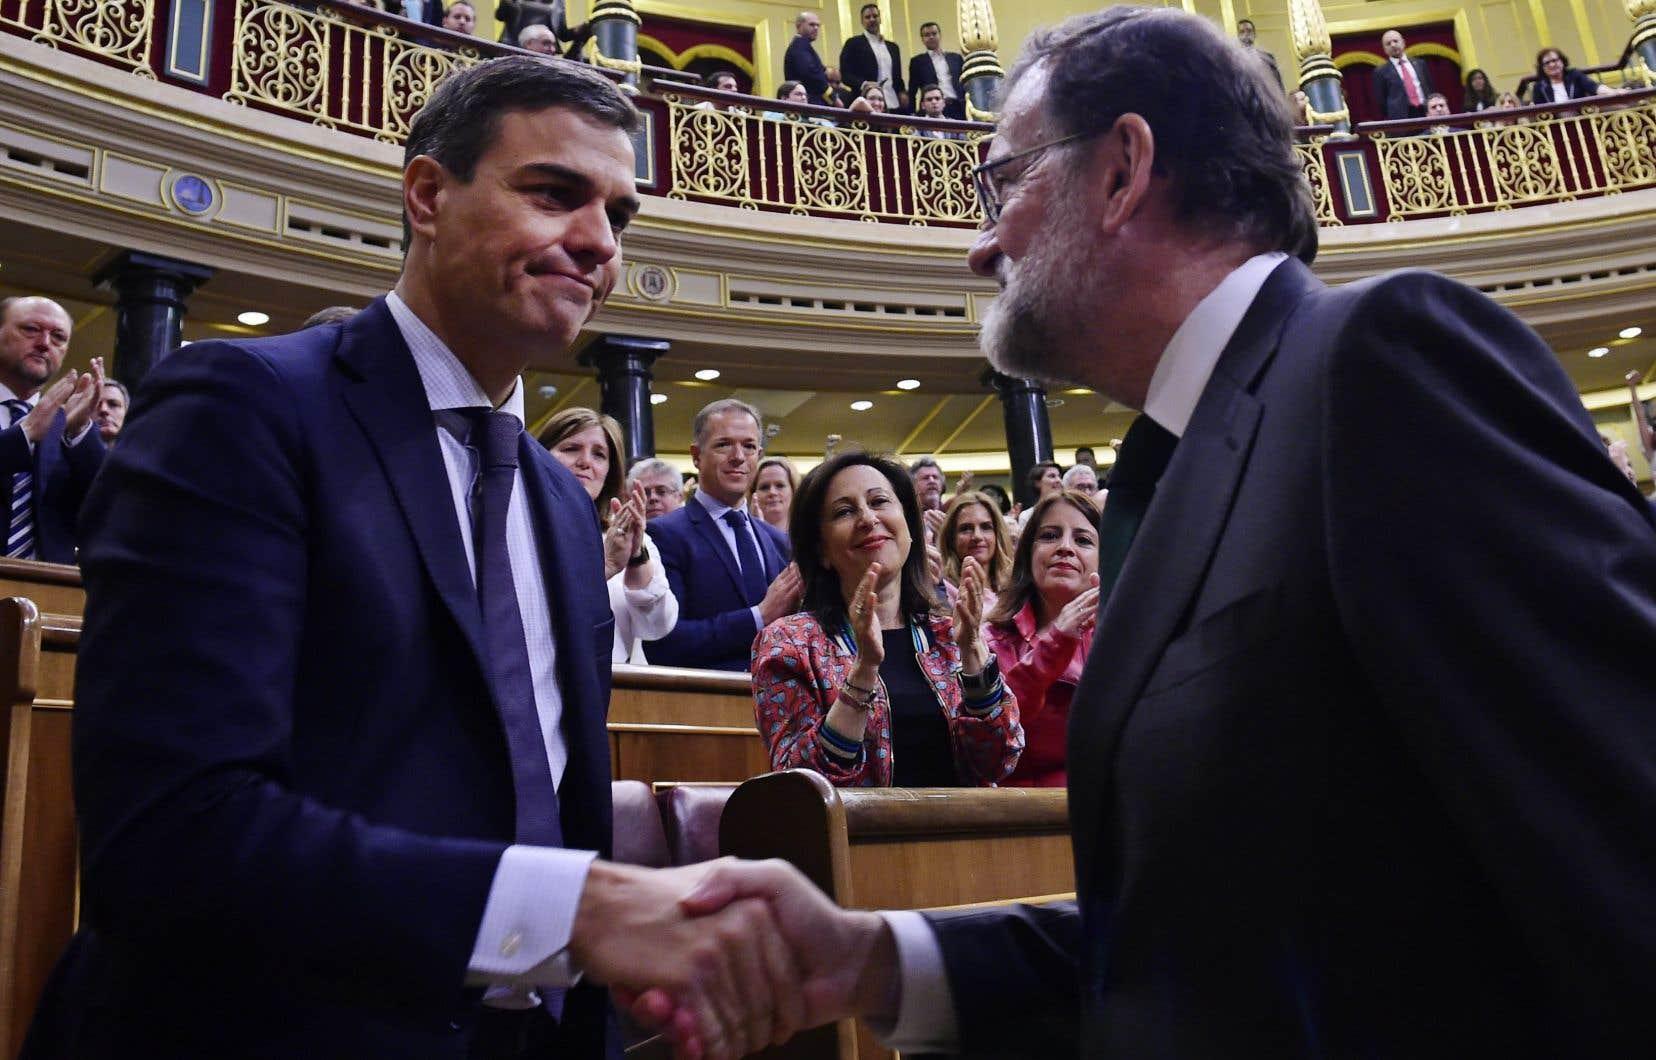 Pedro Sánchez (à gauche) serre la main de Mariano Rajoy.